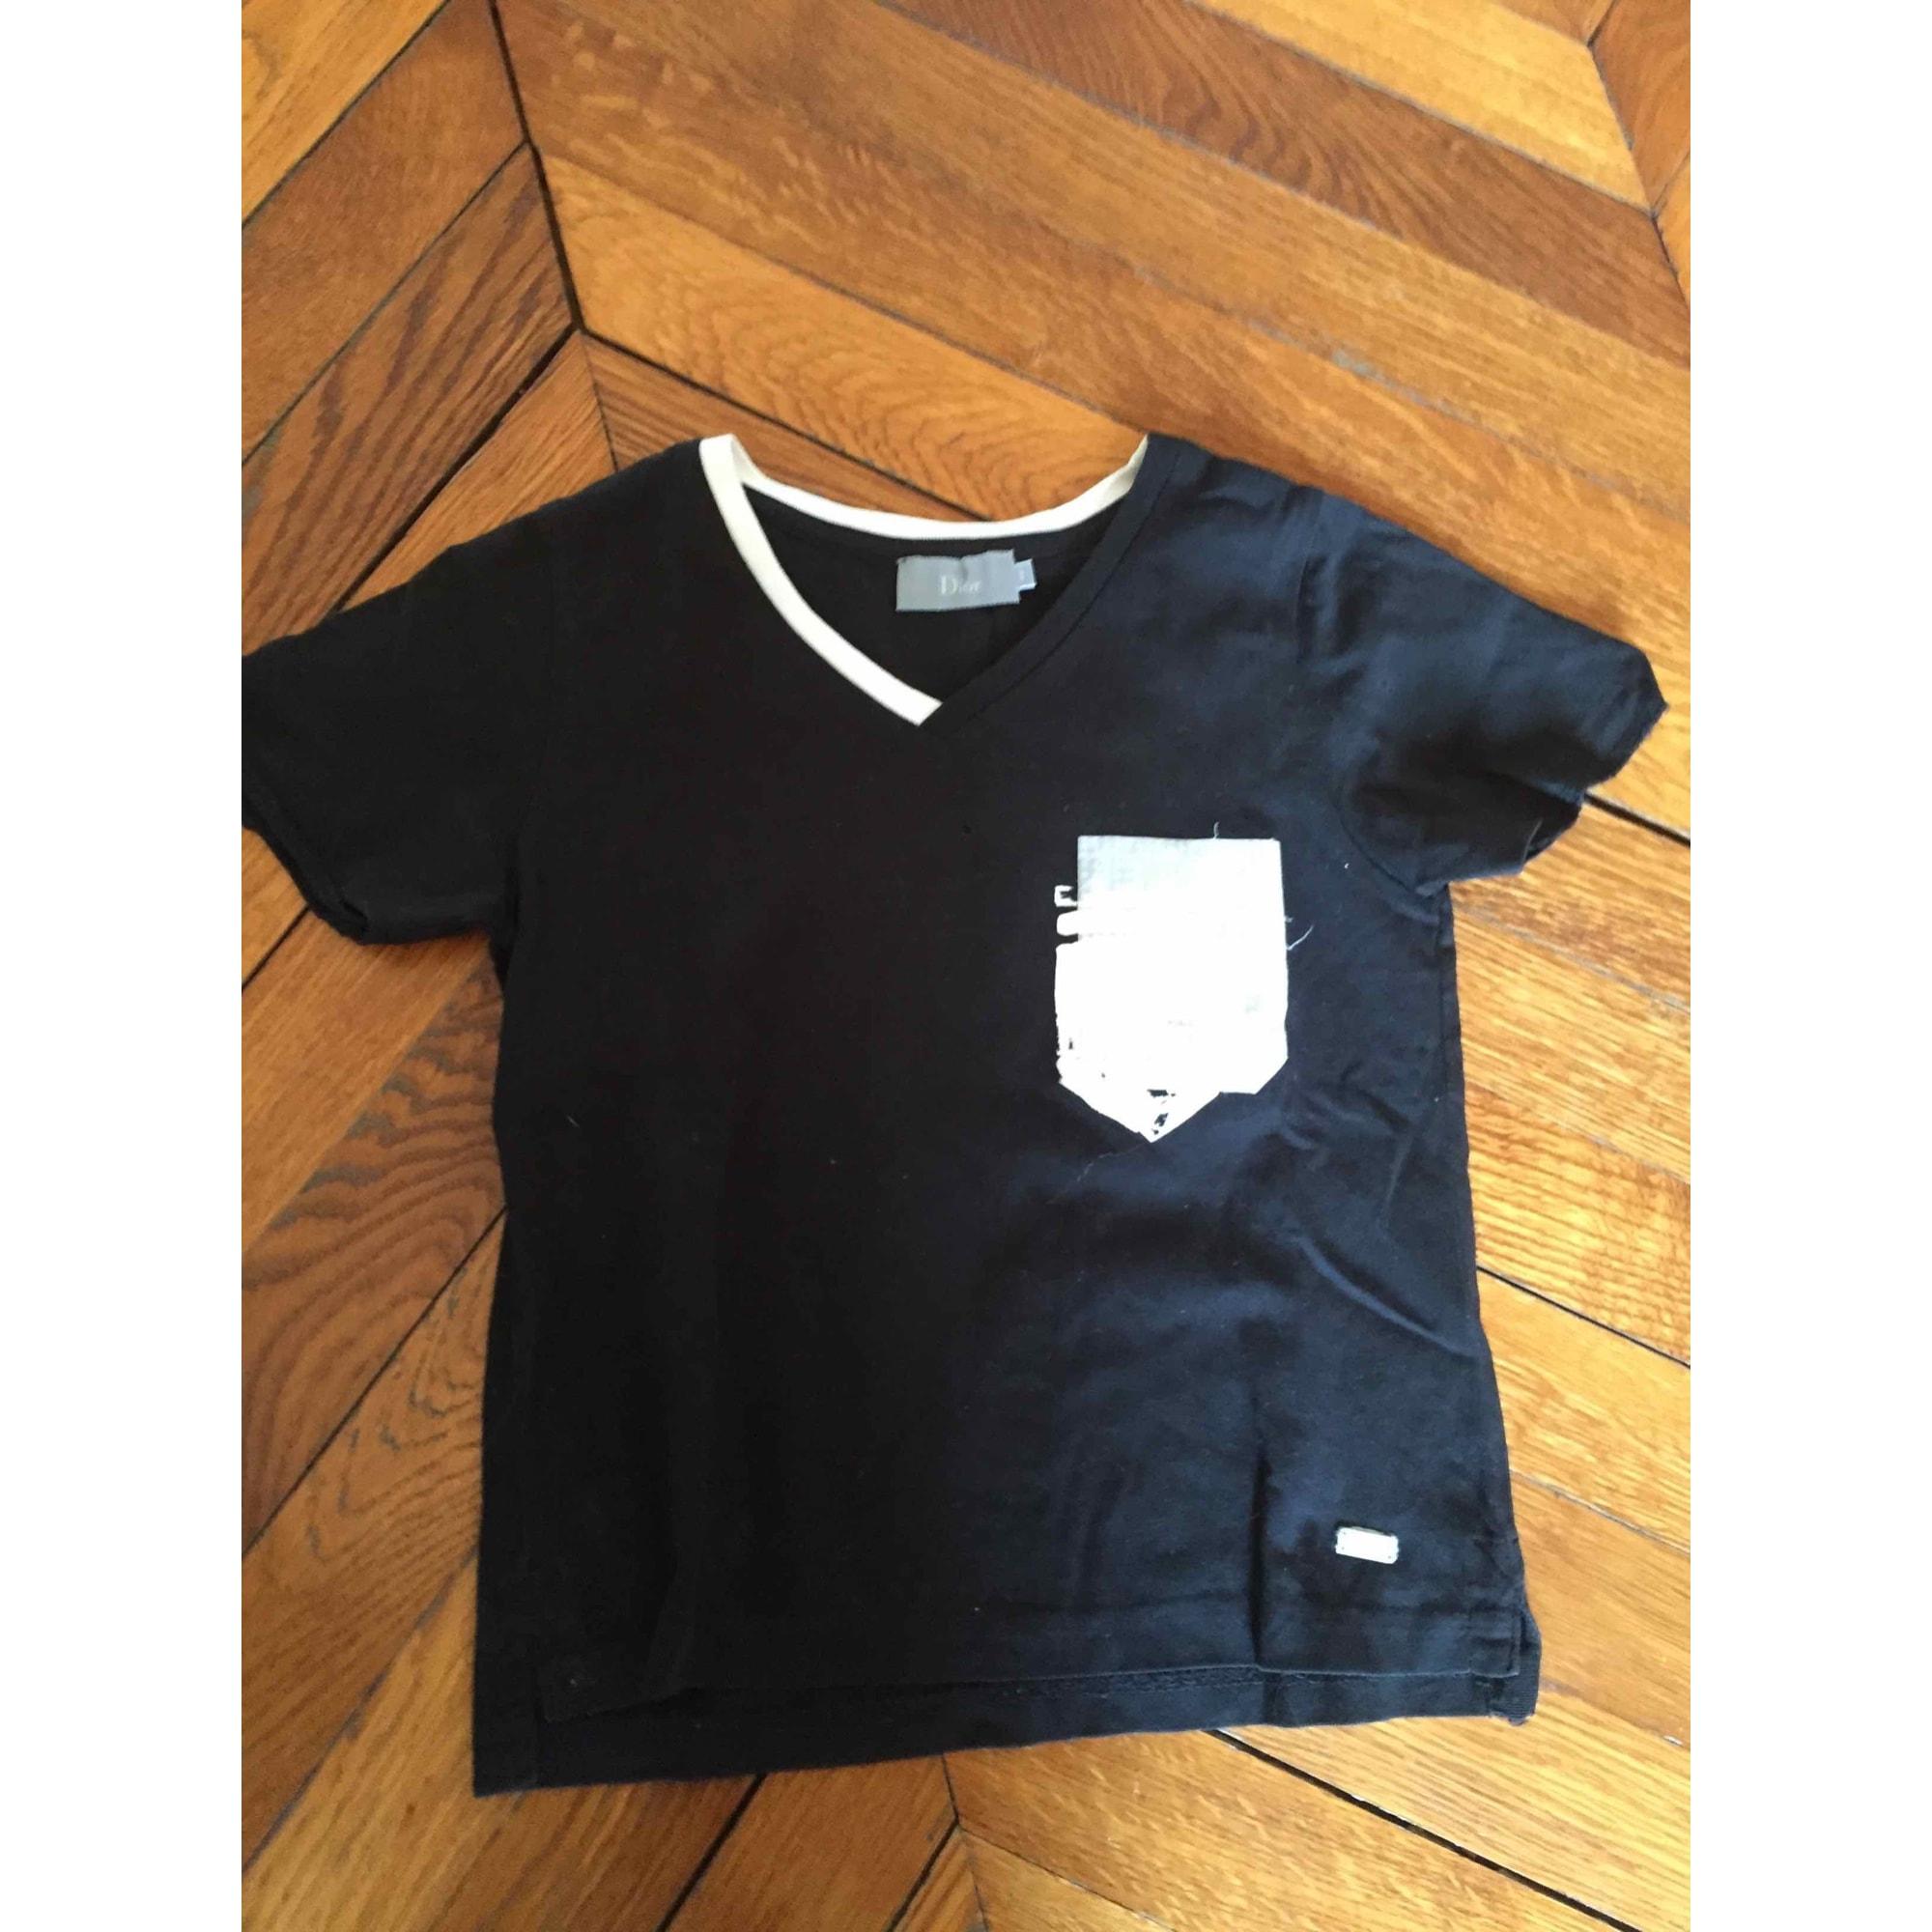 T-shirt BABY DIOR Black